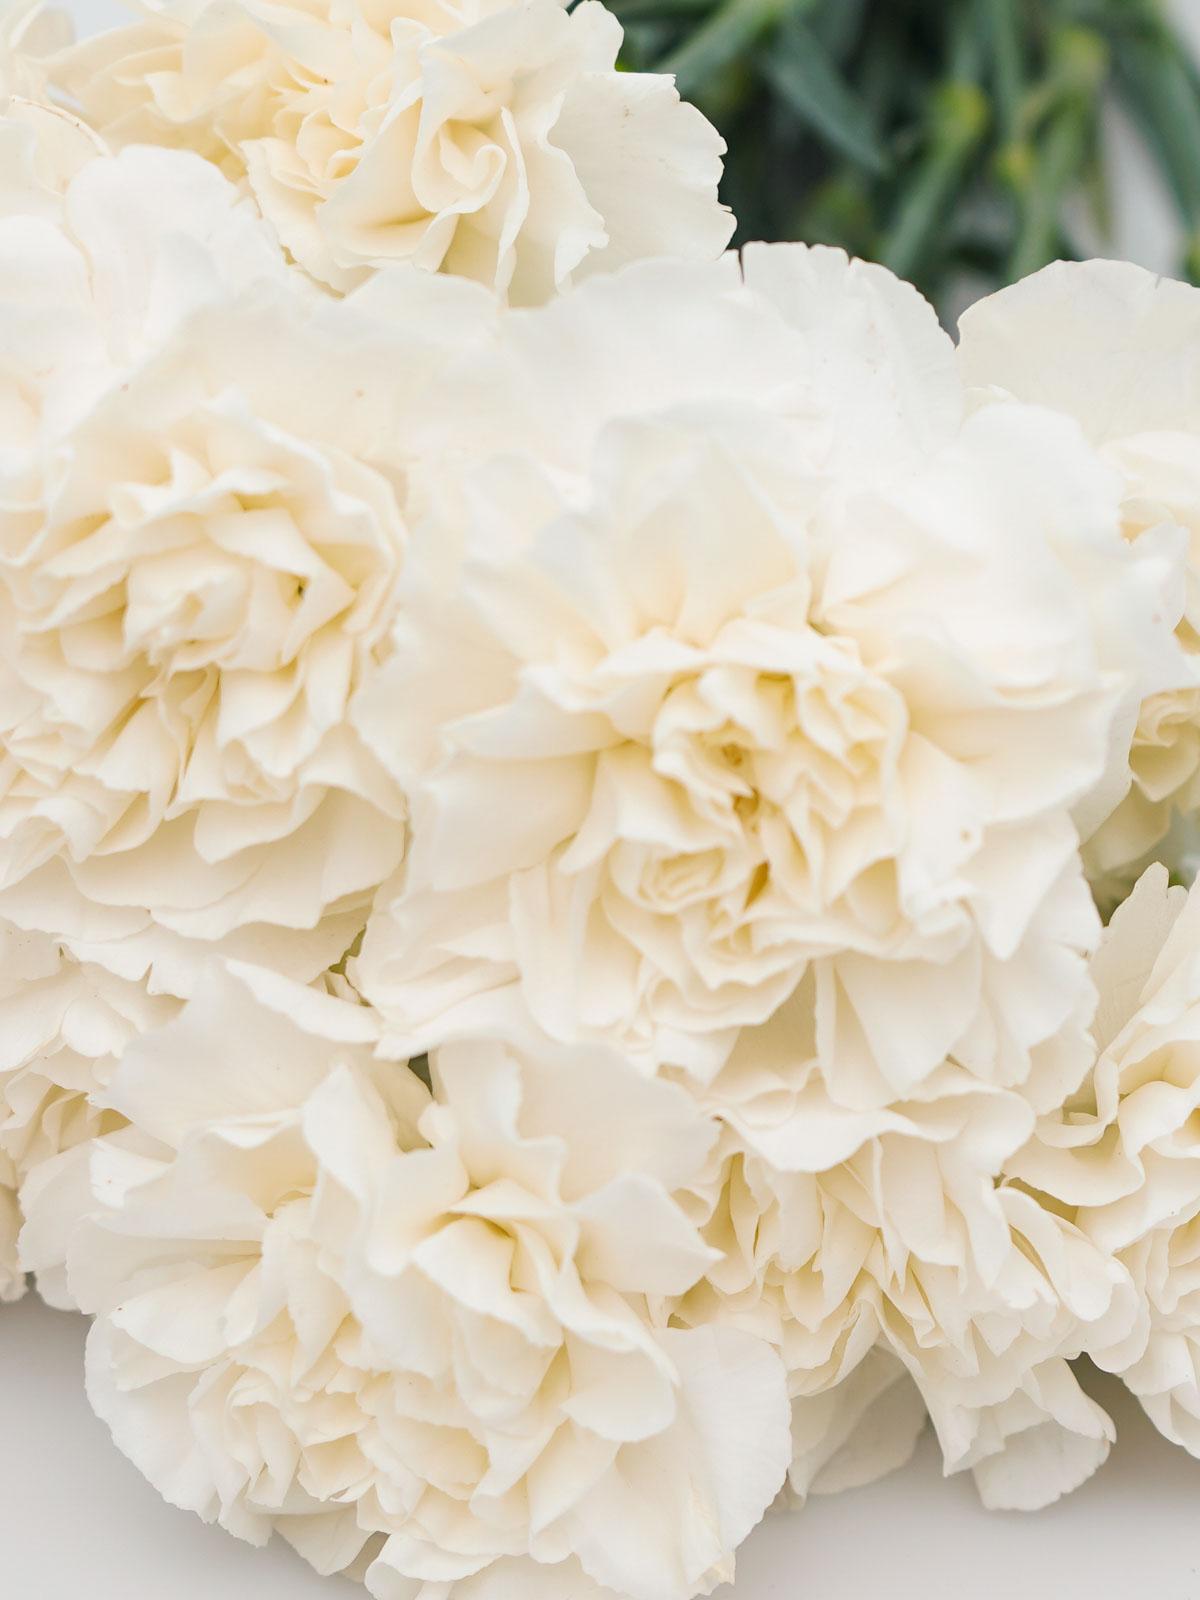 Carnation White 'Wholesale Flowers Cut Flowers